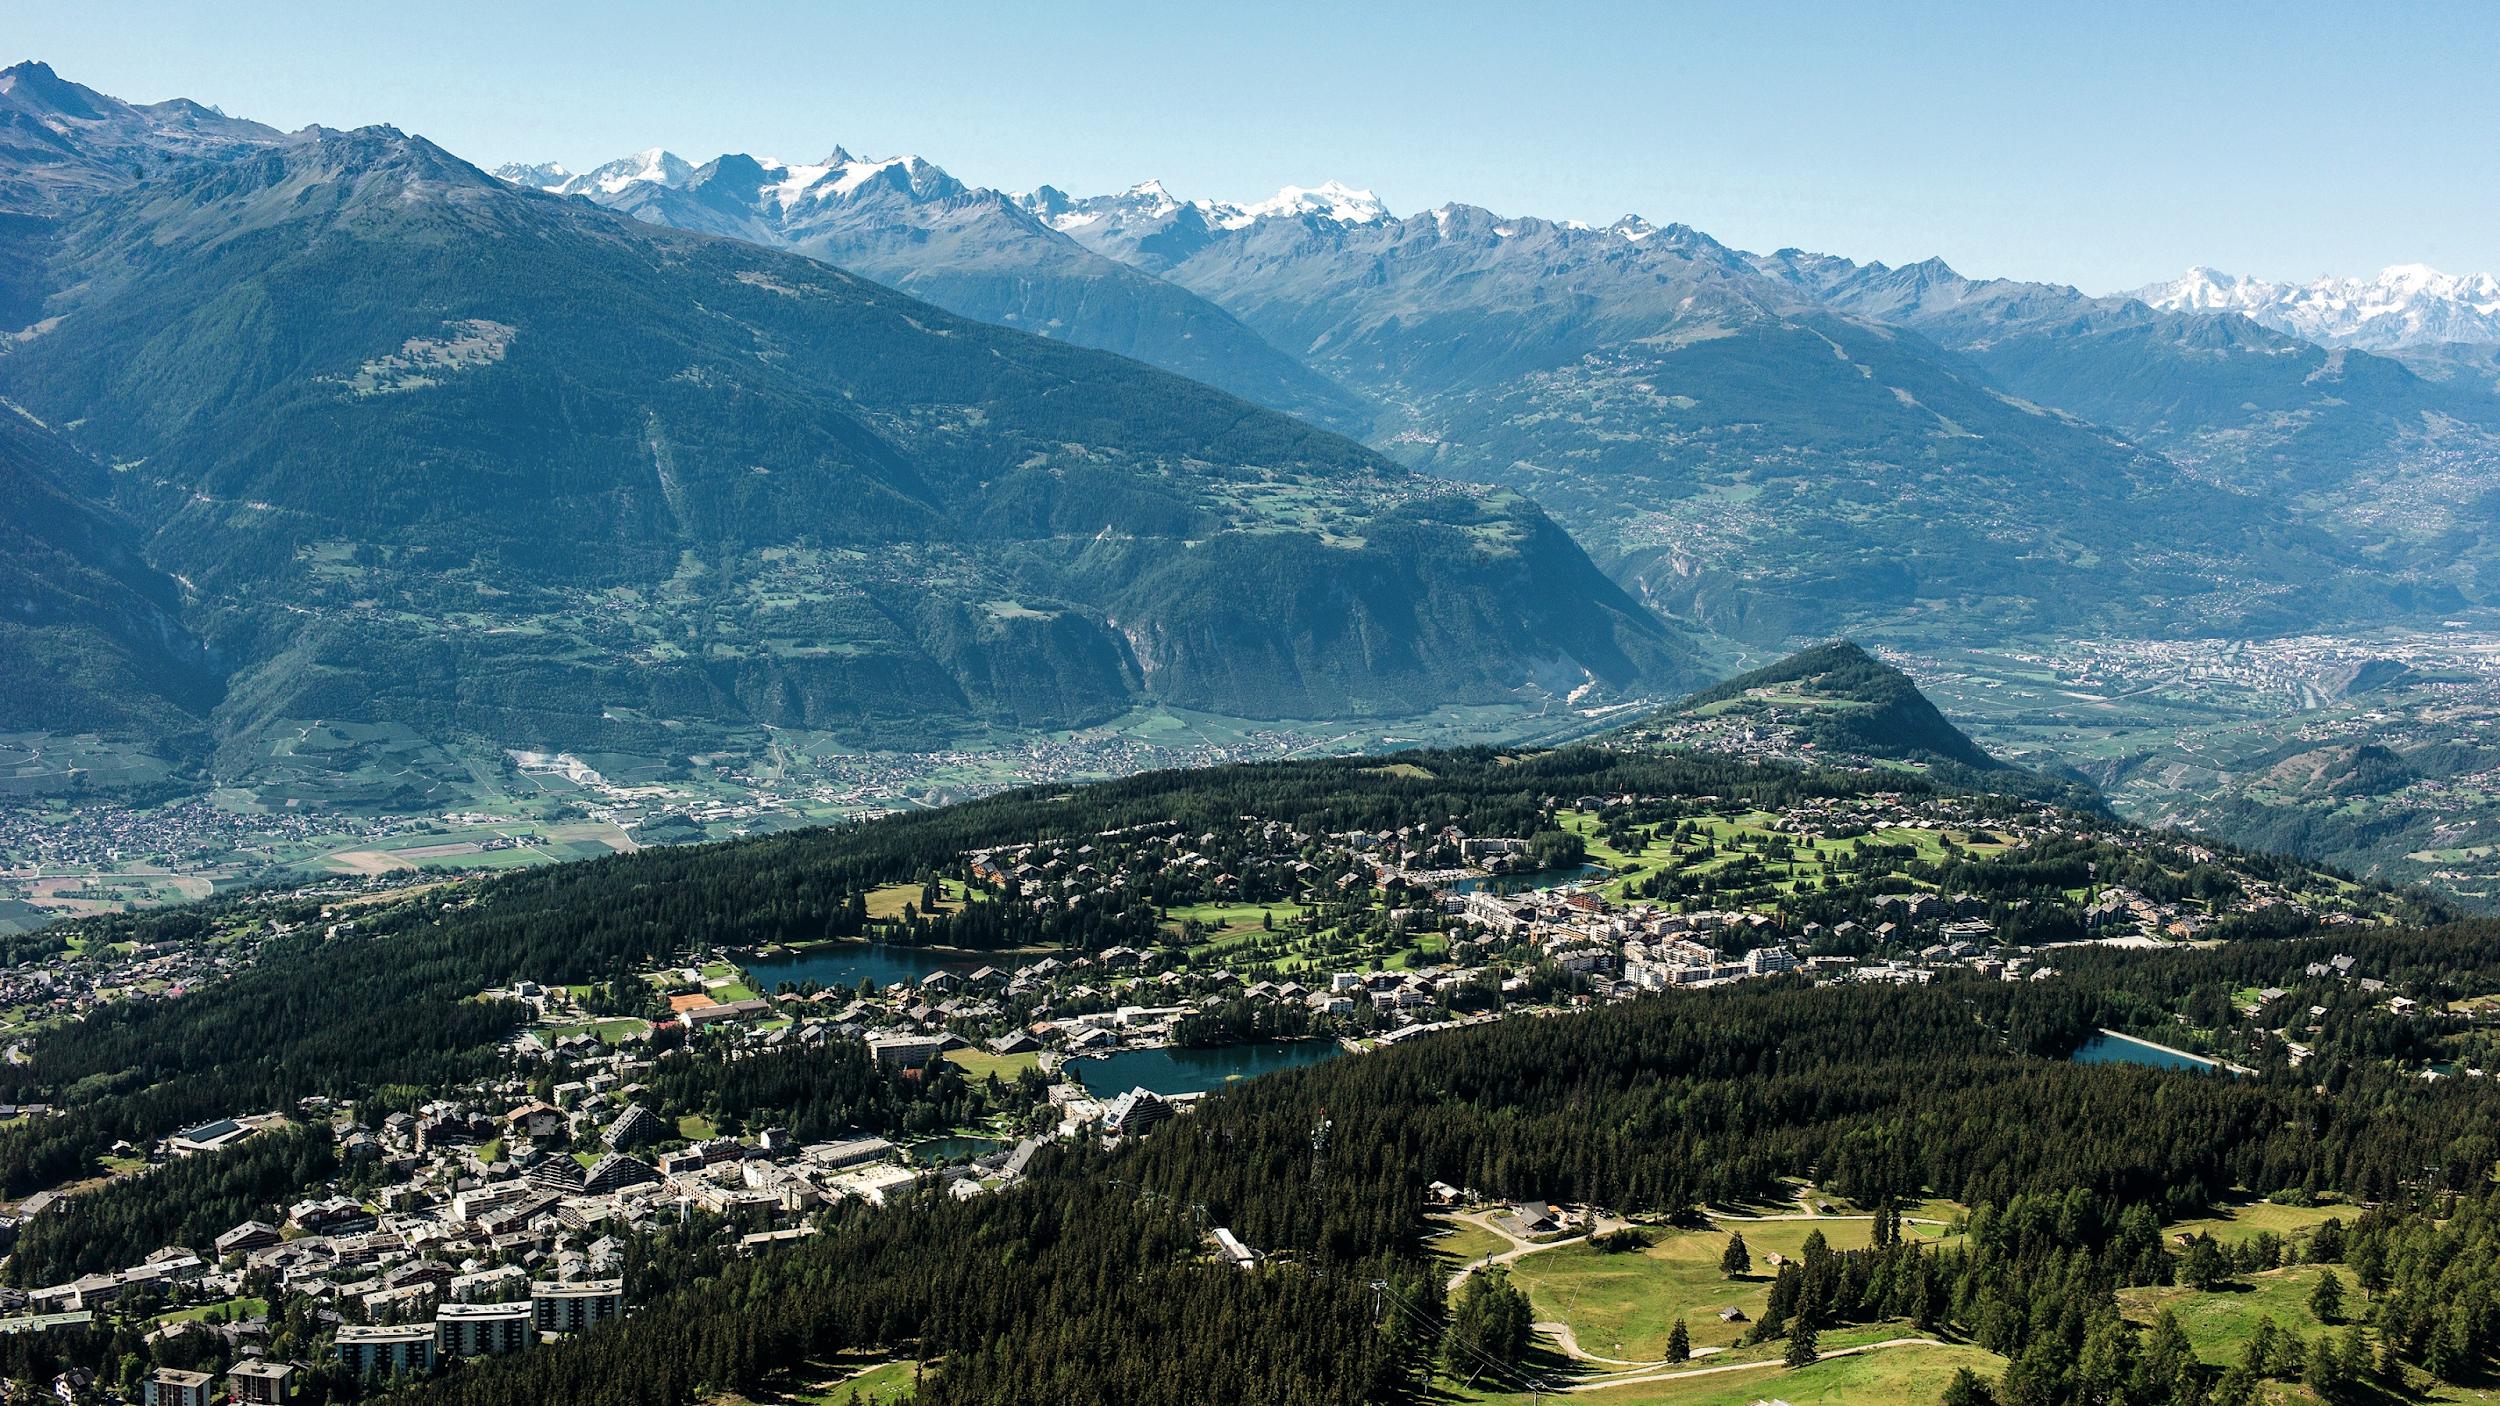 Cran montana mountain view